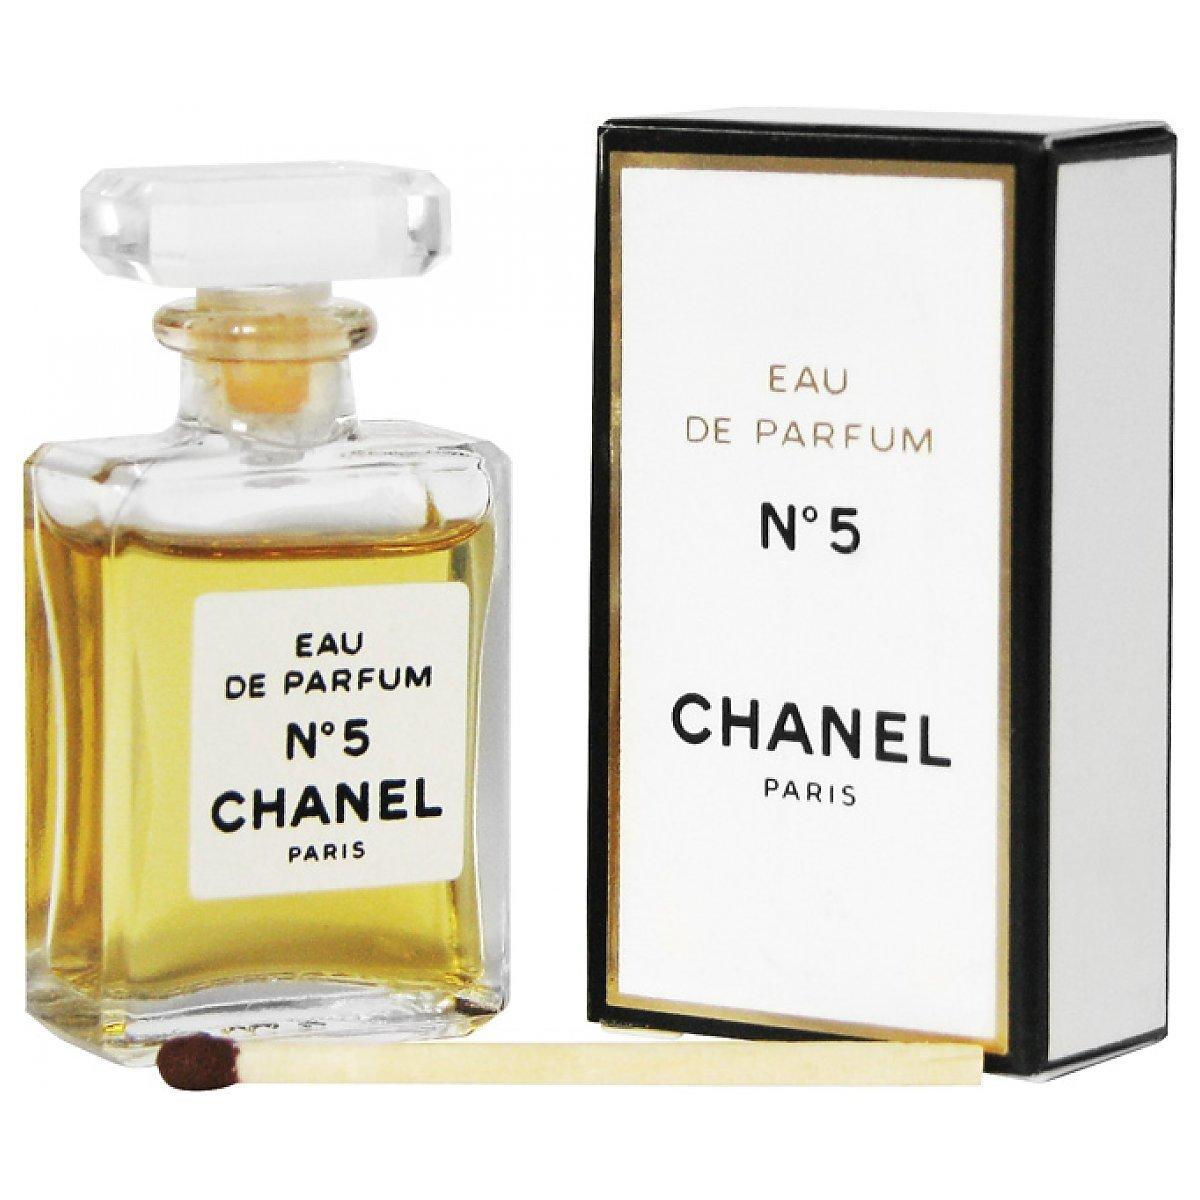 d2a6a4b5dde0a CHANEL No5 Woda perfumowana miniatura, flakon 4ml - Perfumeria Dolce.pl